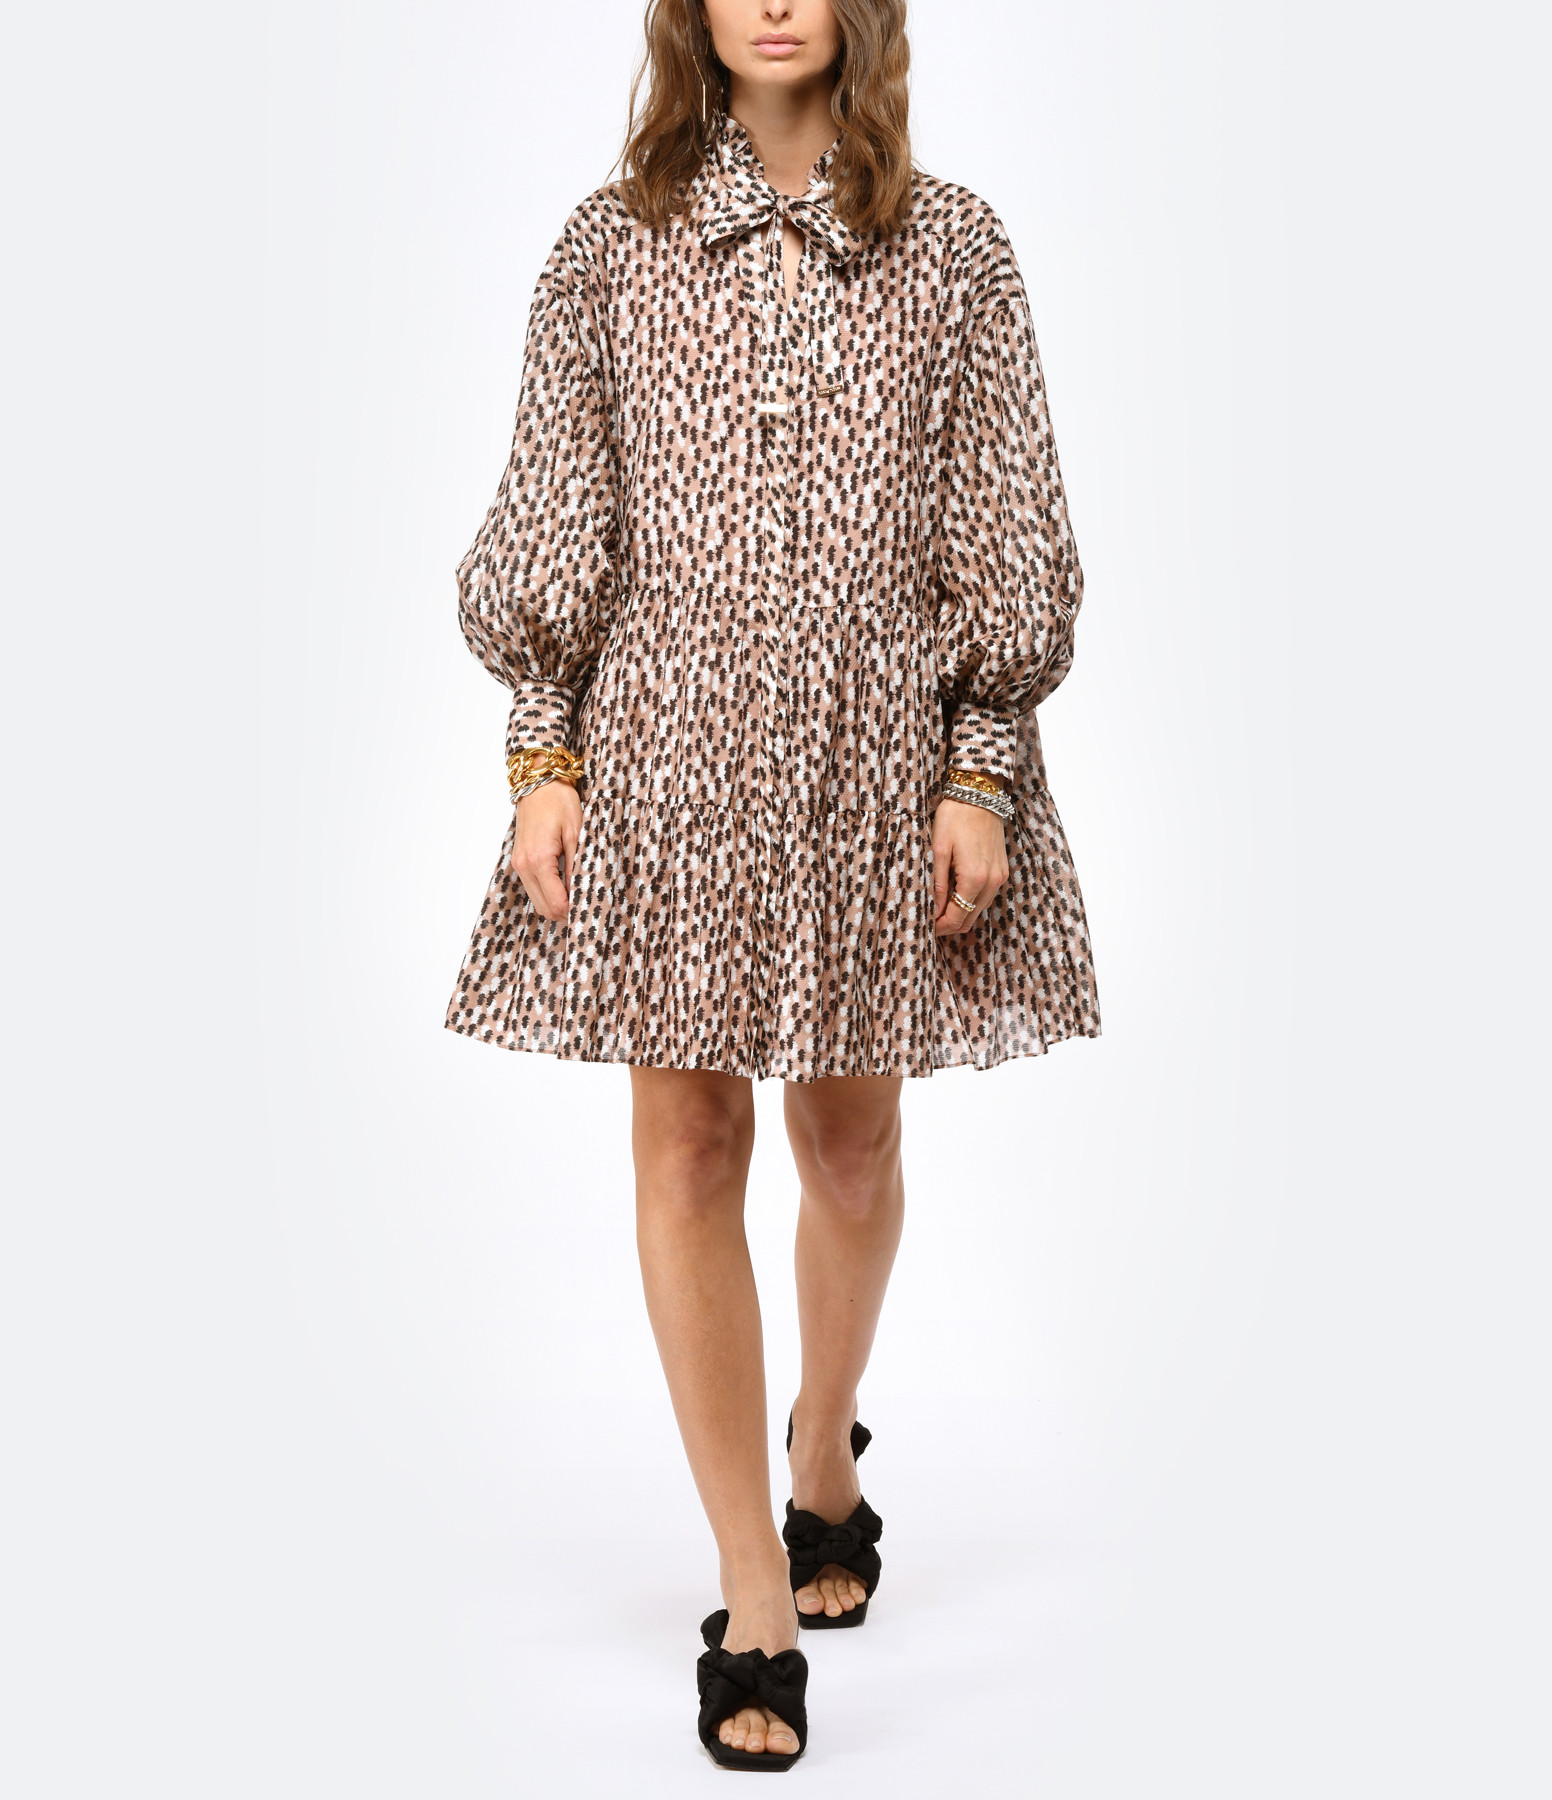 MAGALI PASCAL - Robe Glory Soie Coton Brush Imprimé